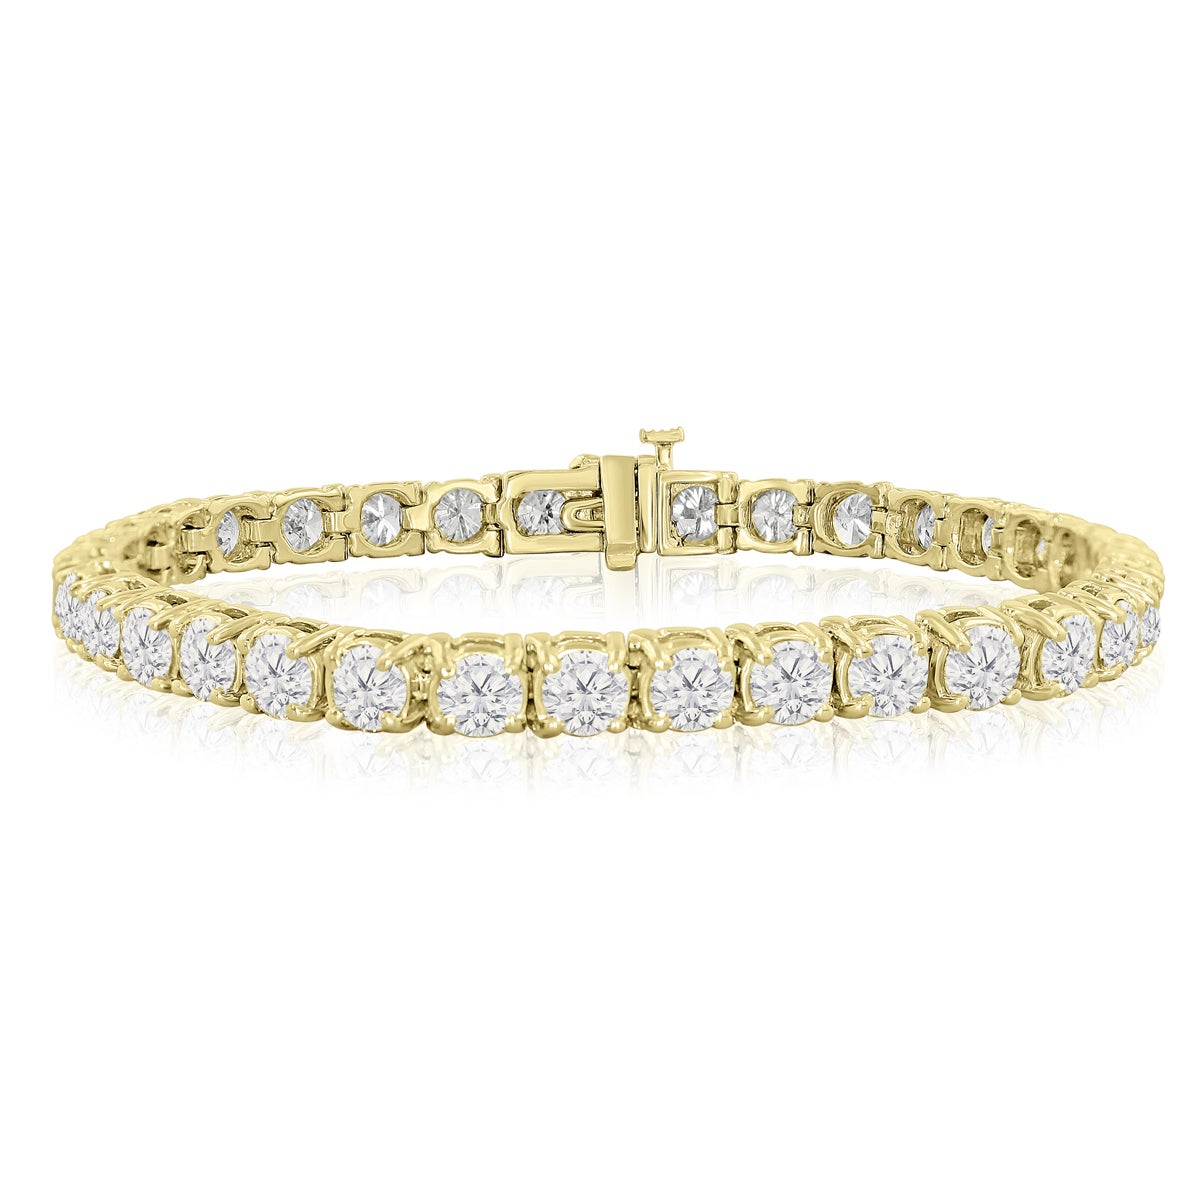 14k Yellow Gold 10 Carat Tdw Round Diamond Tennis Bracelet J K I2 I3 White On Free Shipping Today 11531429